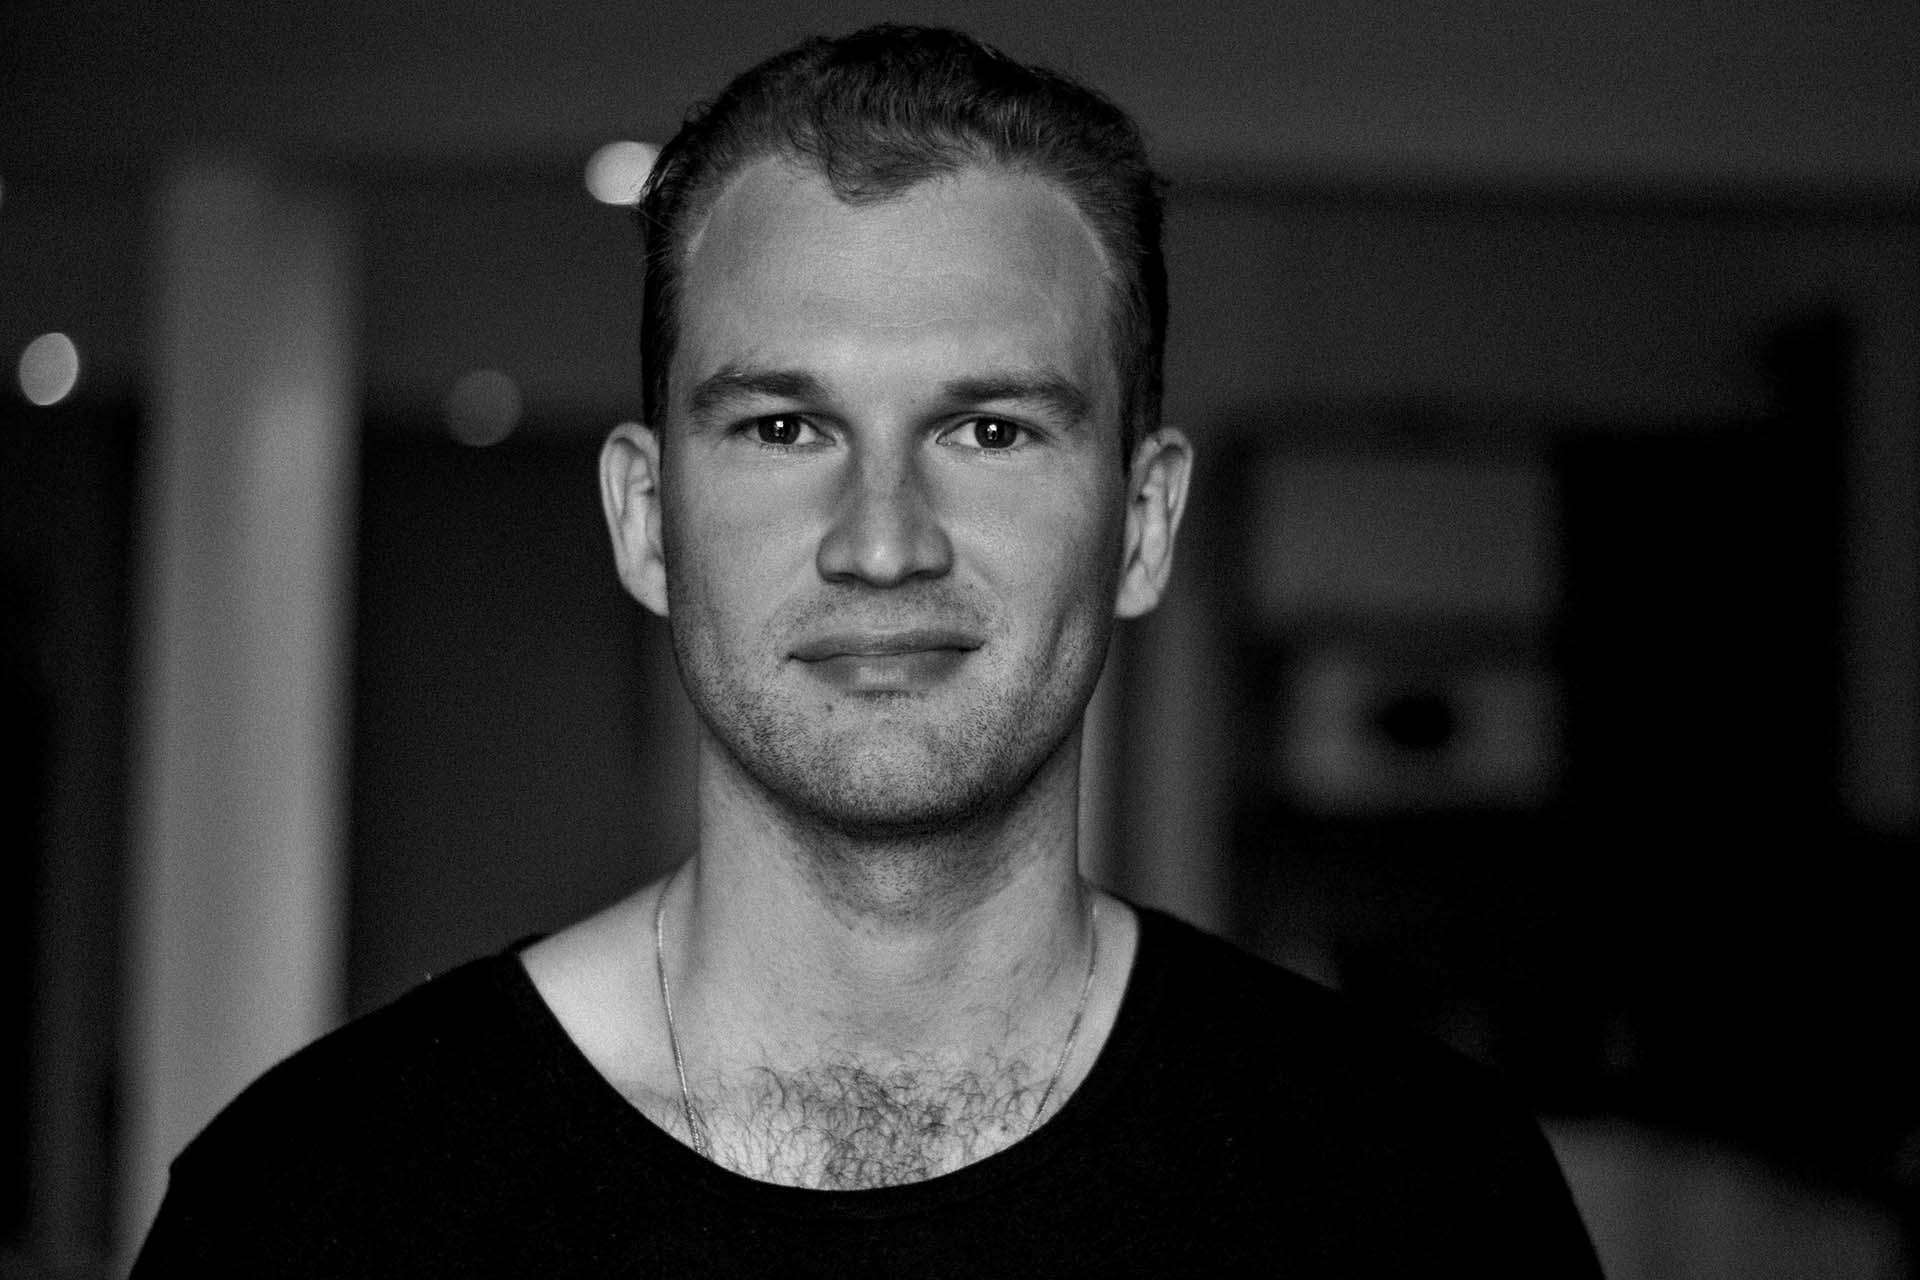 Марк Каменских, интернет-маркетолог со стажем более 10 лет